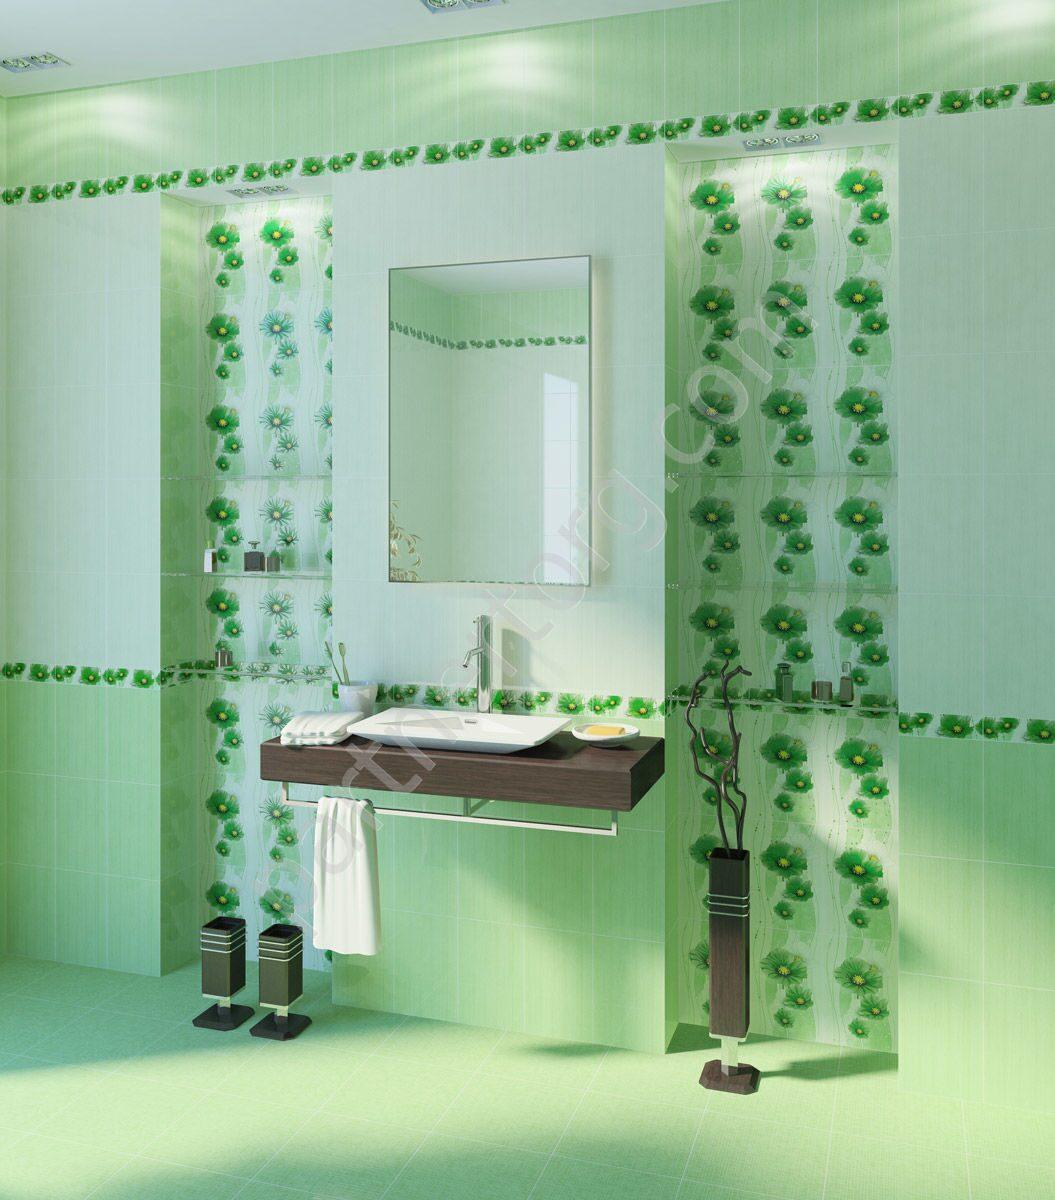 ciment colle carrelage hydrofuge le tampon issy les moulineaux grenoble prix renovation. Black Bedroom Furniture Sets. Home Design Ideas